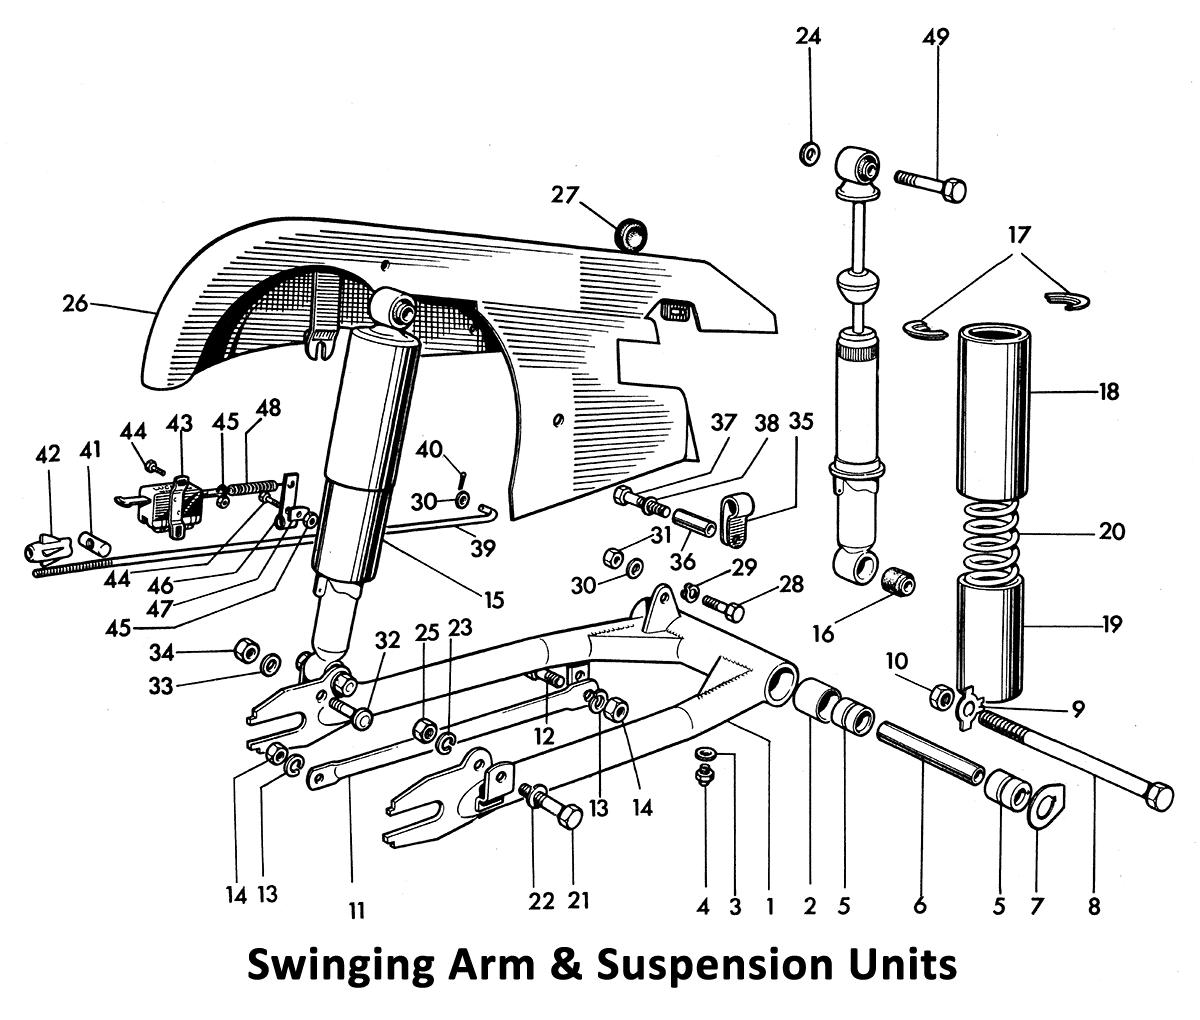 1964 Triumph 650 Twins T120, TR6, 6T Swinging Arm & Suspension Units